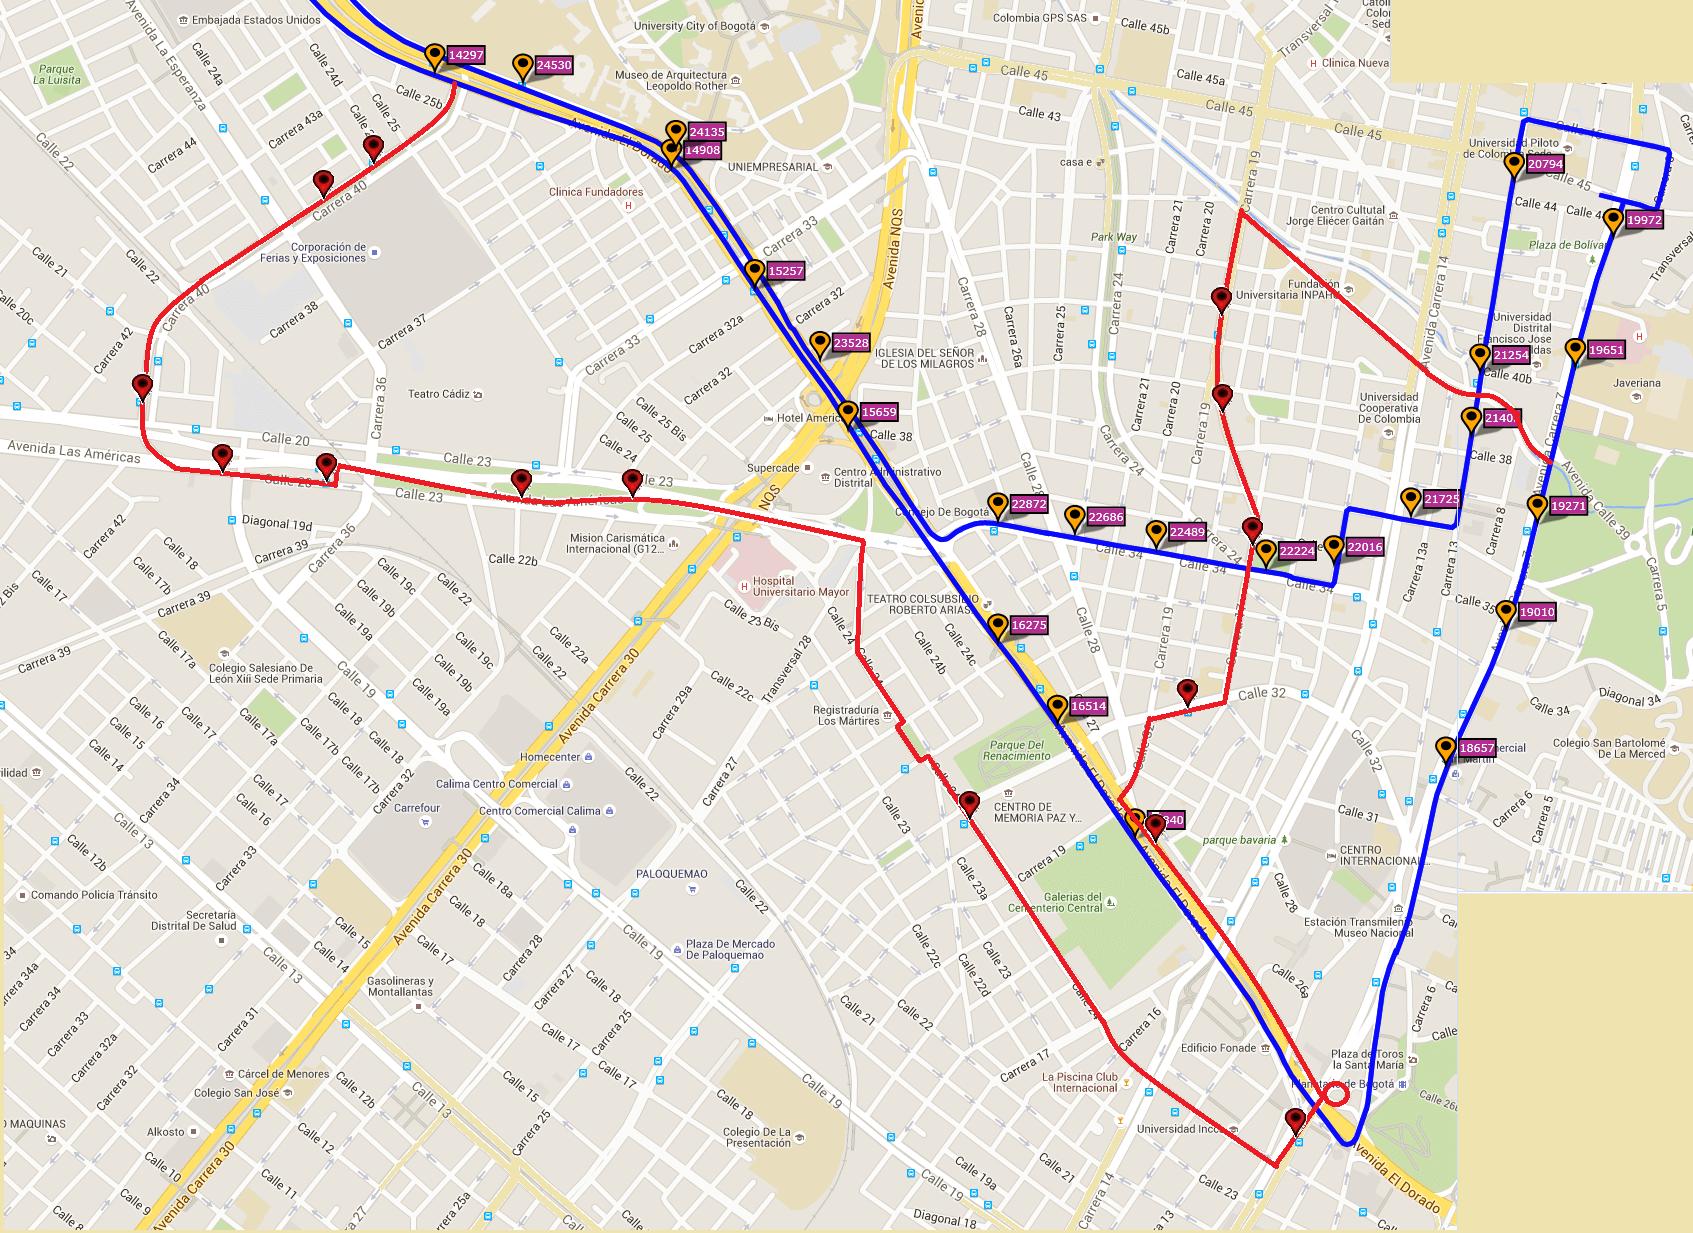 Ruta SITP: Ruta T40 - Catalina II ↔ Marly [Urbana] 4